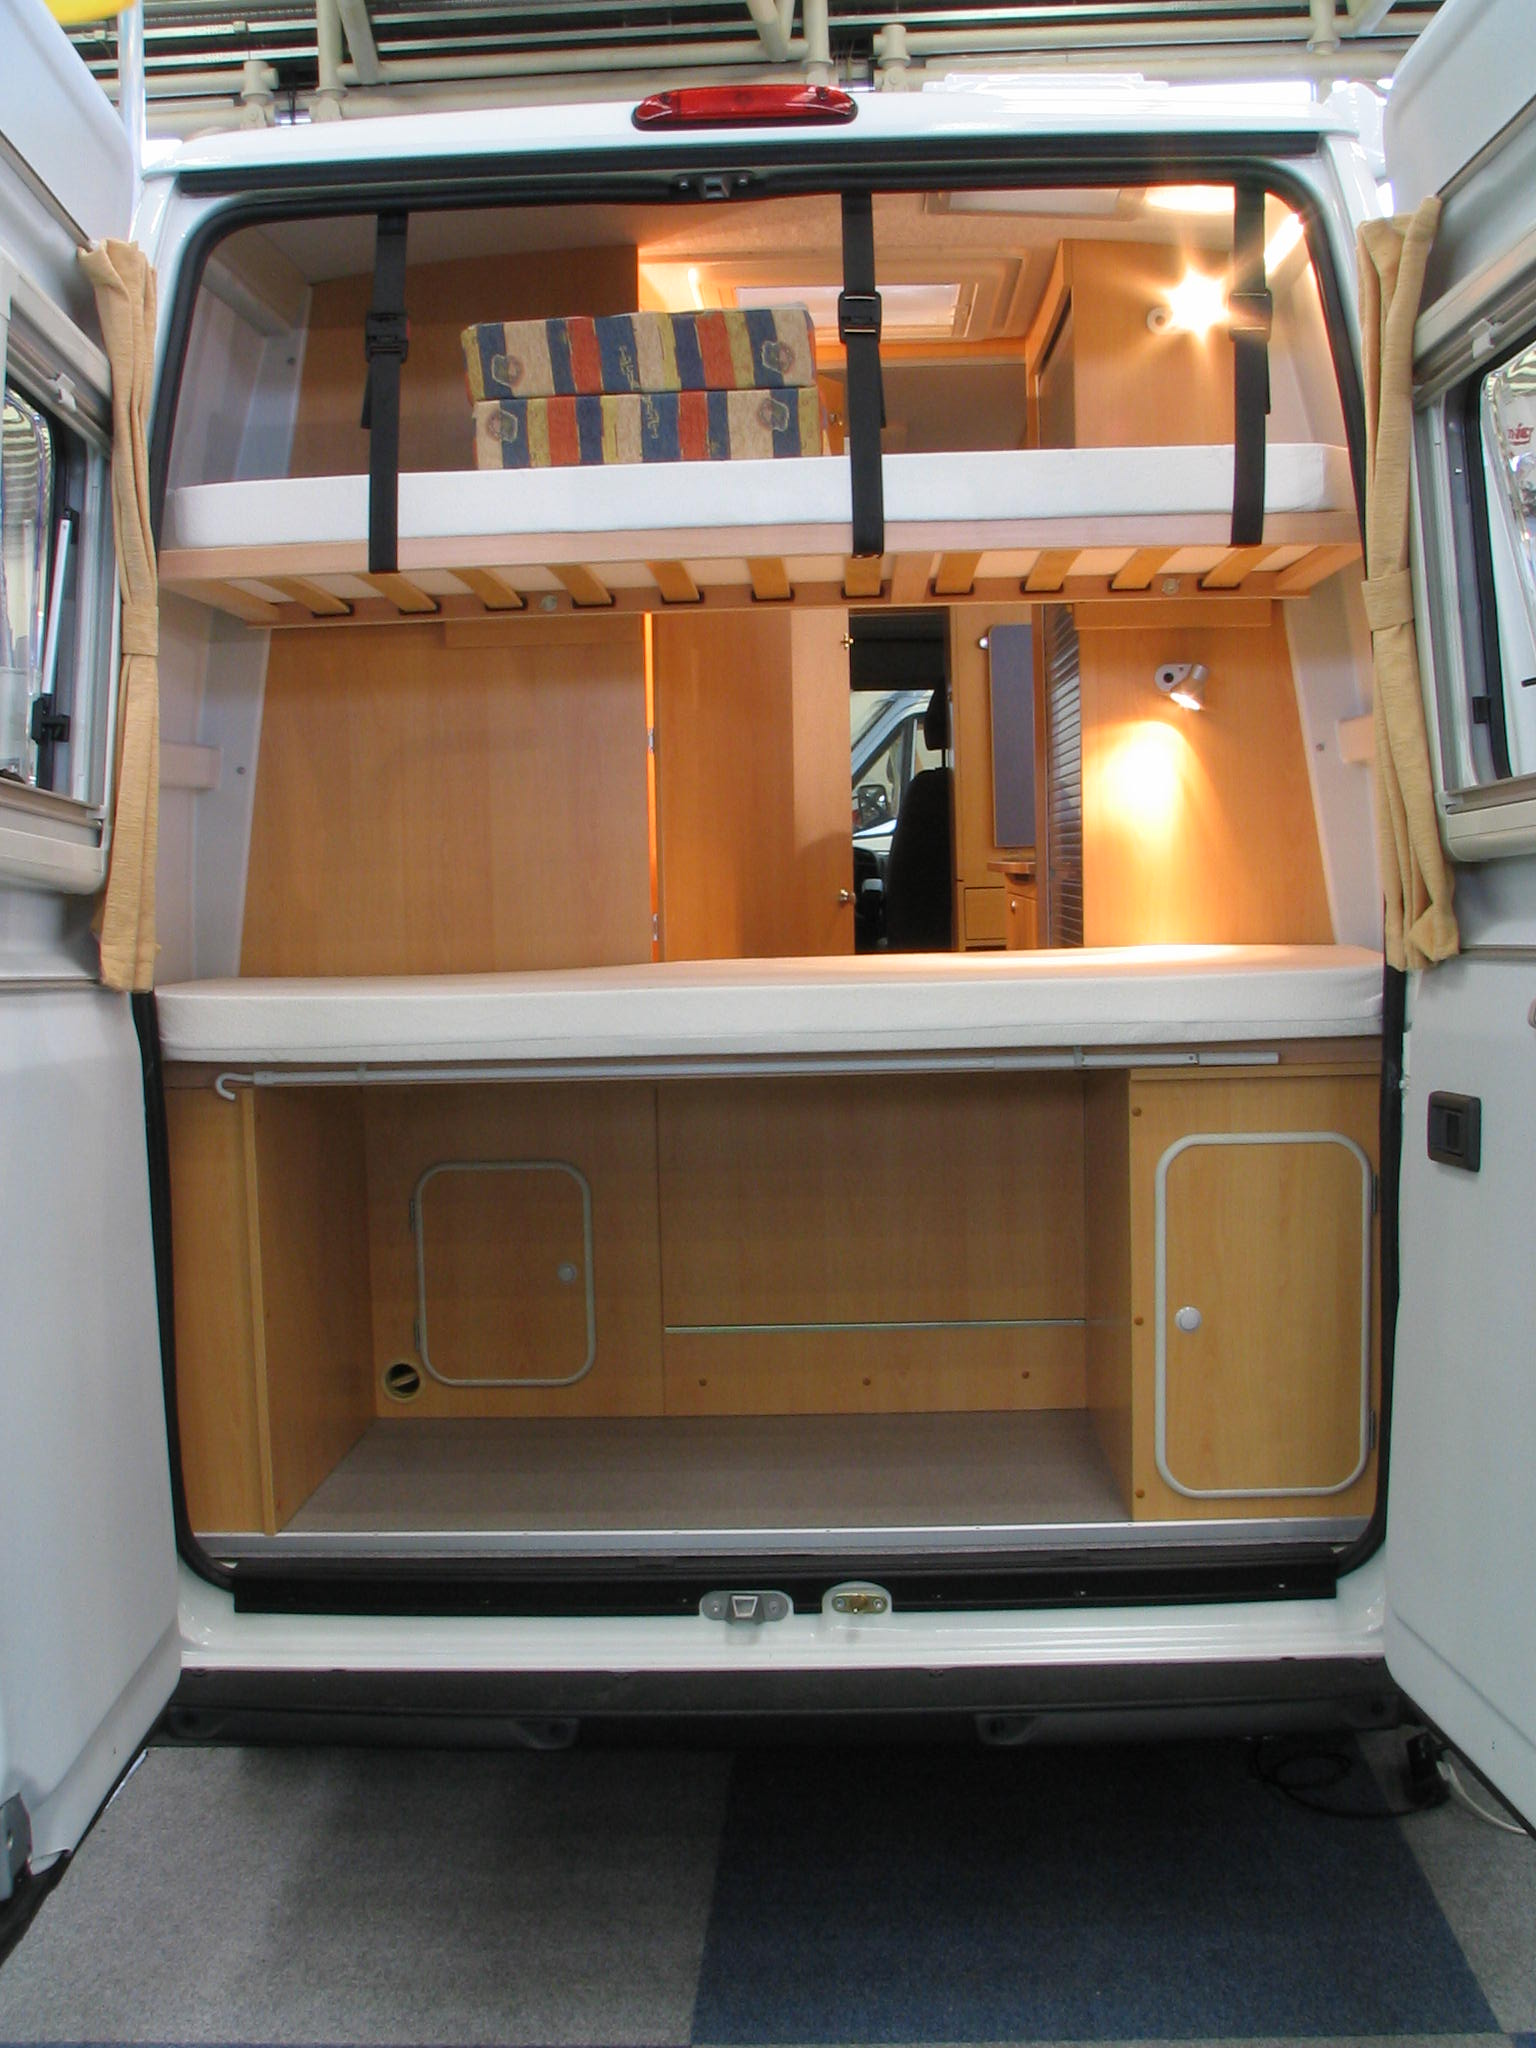 Fiat ducato campingausbau mit stockbetten for Fiat ducato camper ausbau